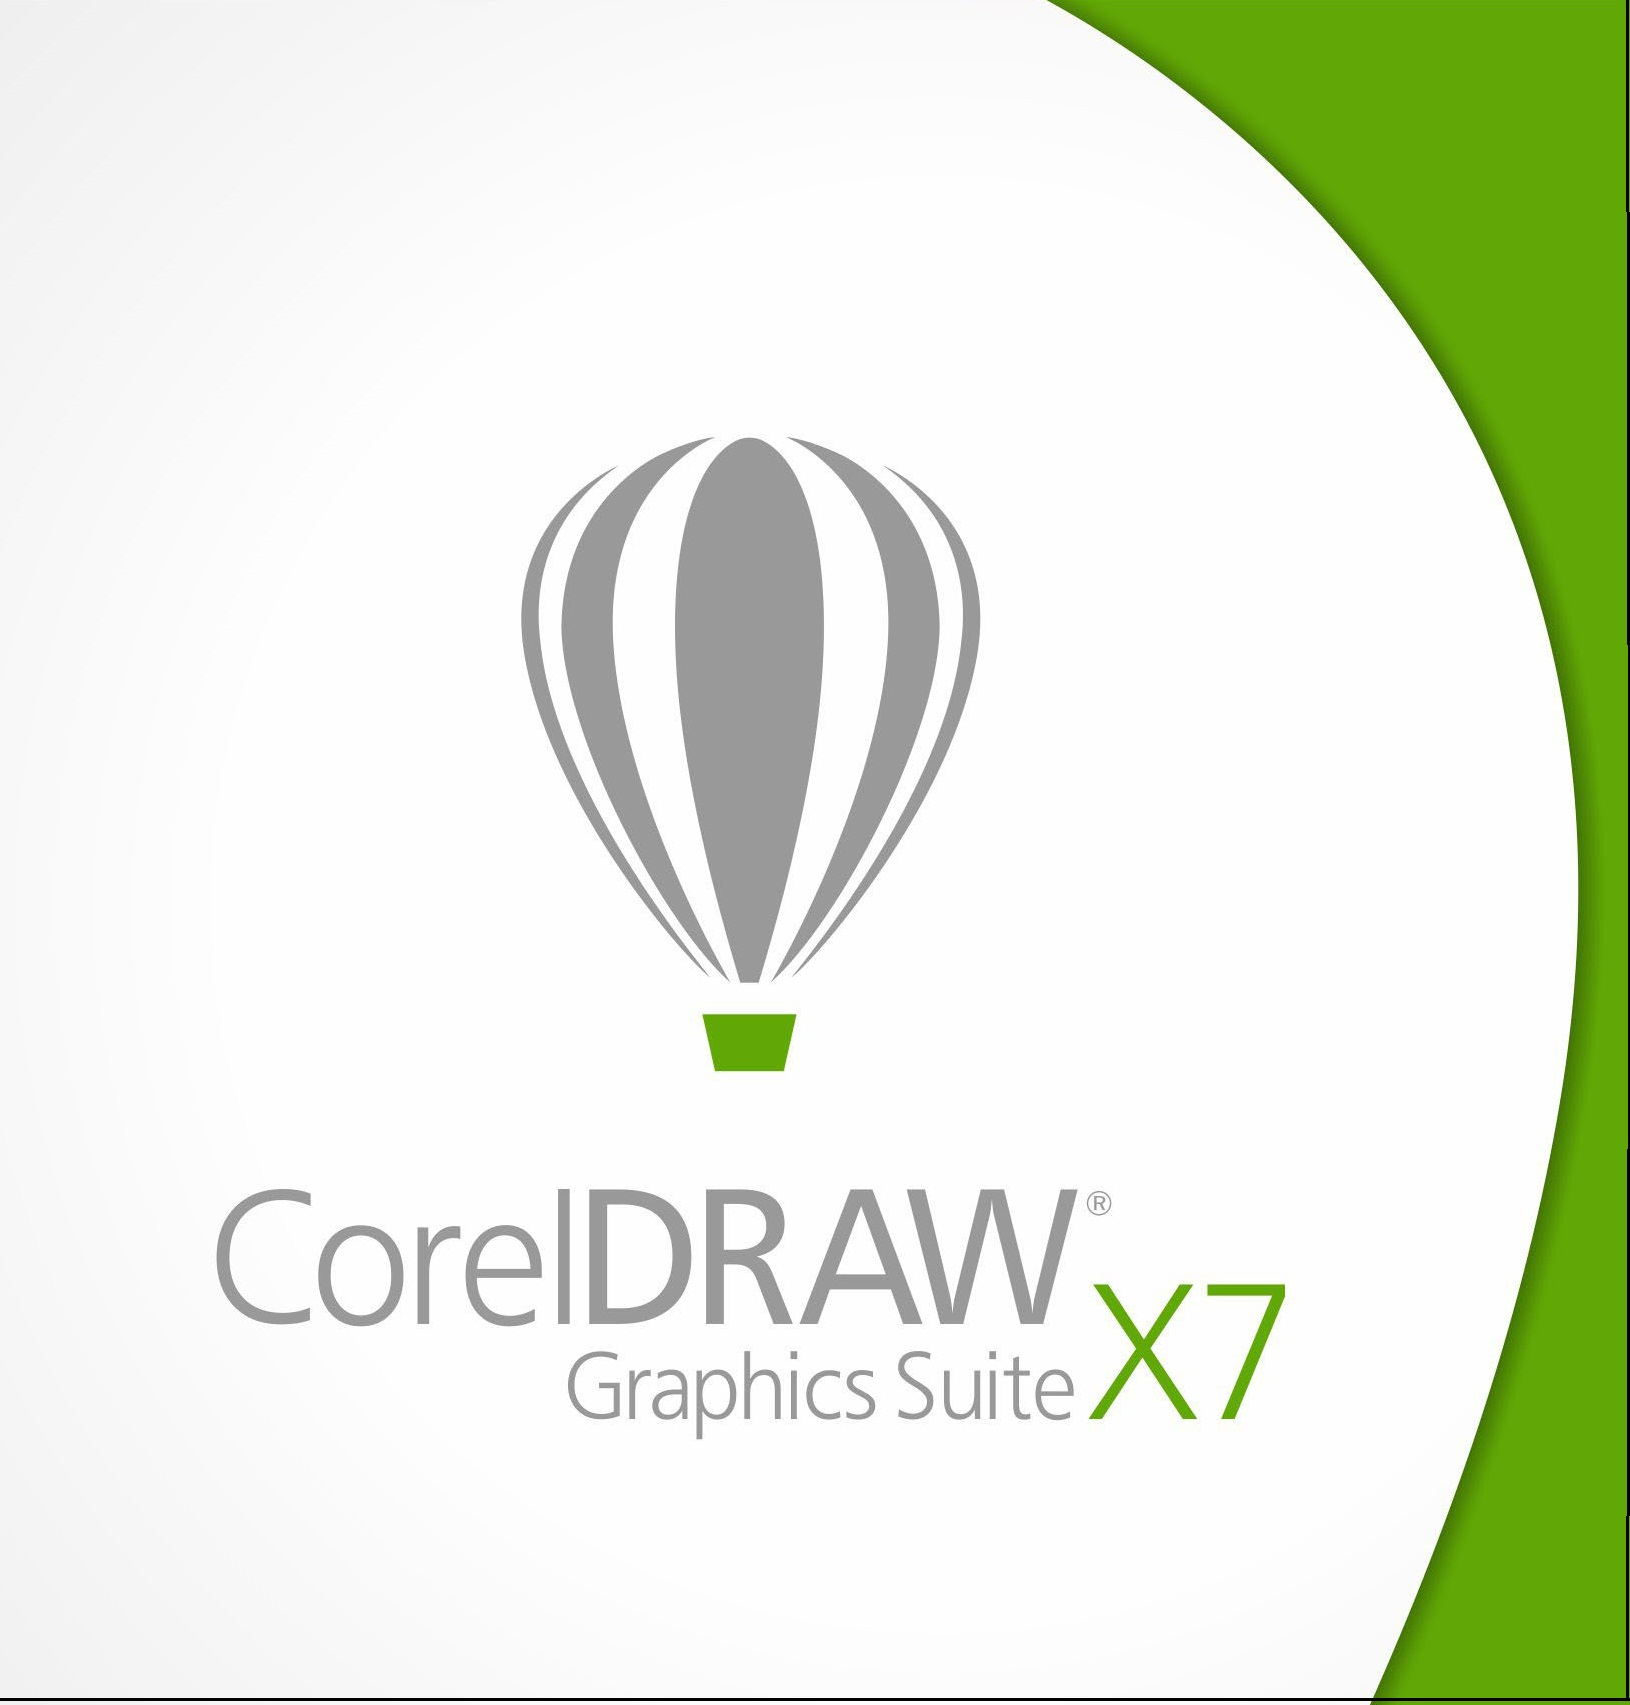 CorelDraw Graphics Suite X7 Free Download - WebForPC